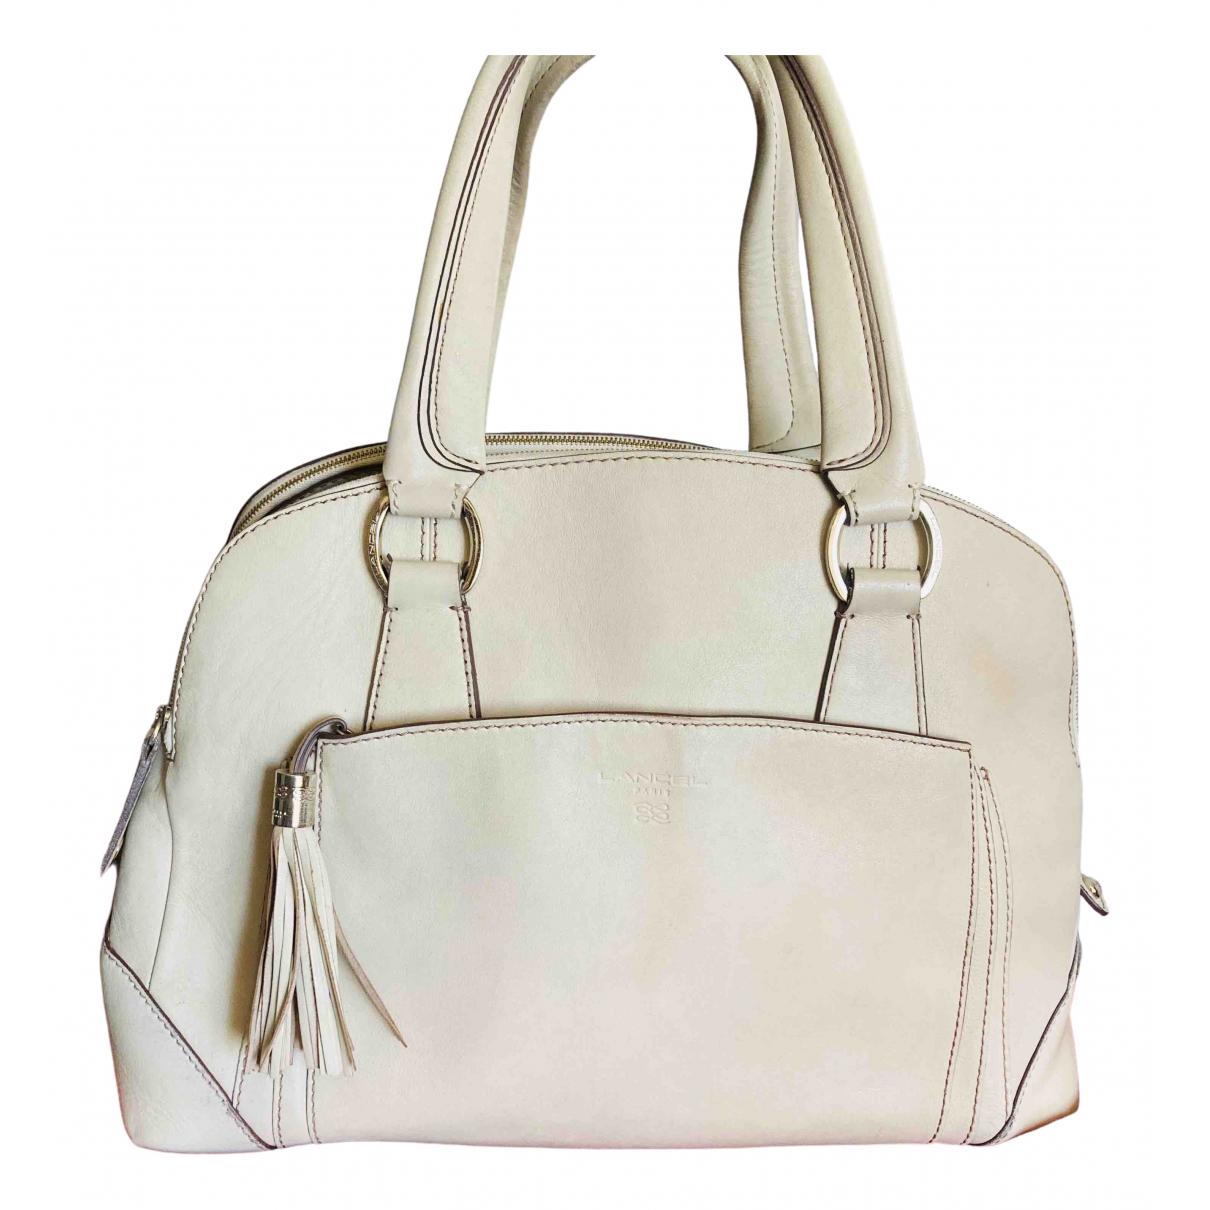 Lancel Mademoiselle Adjani Handtasche in  Ecru Leder